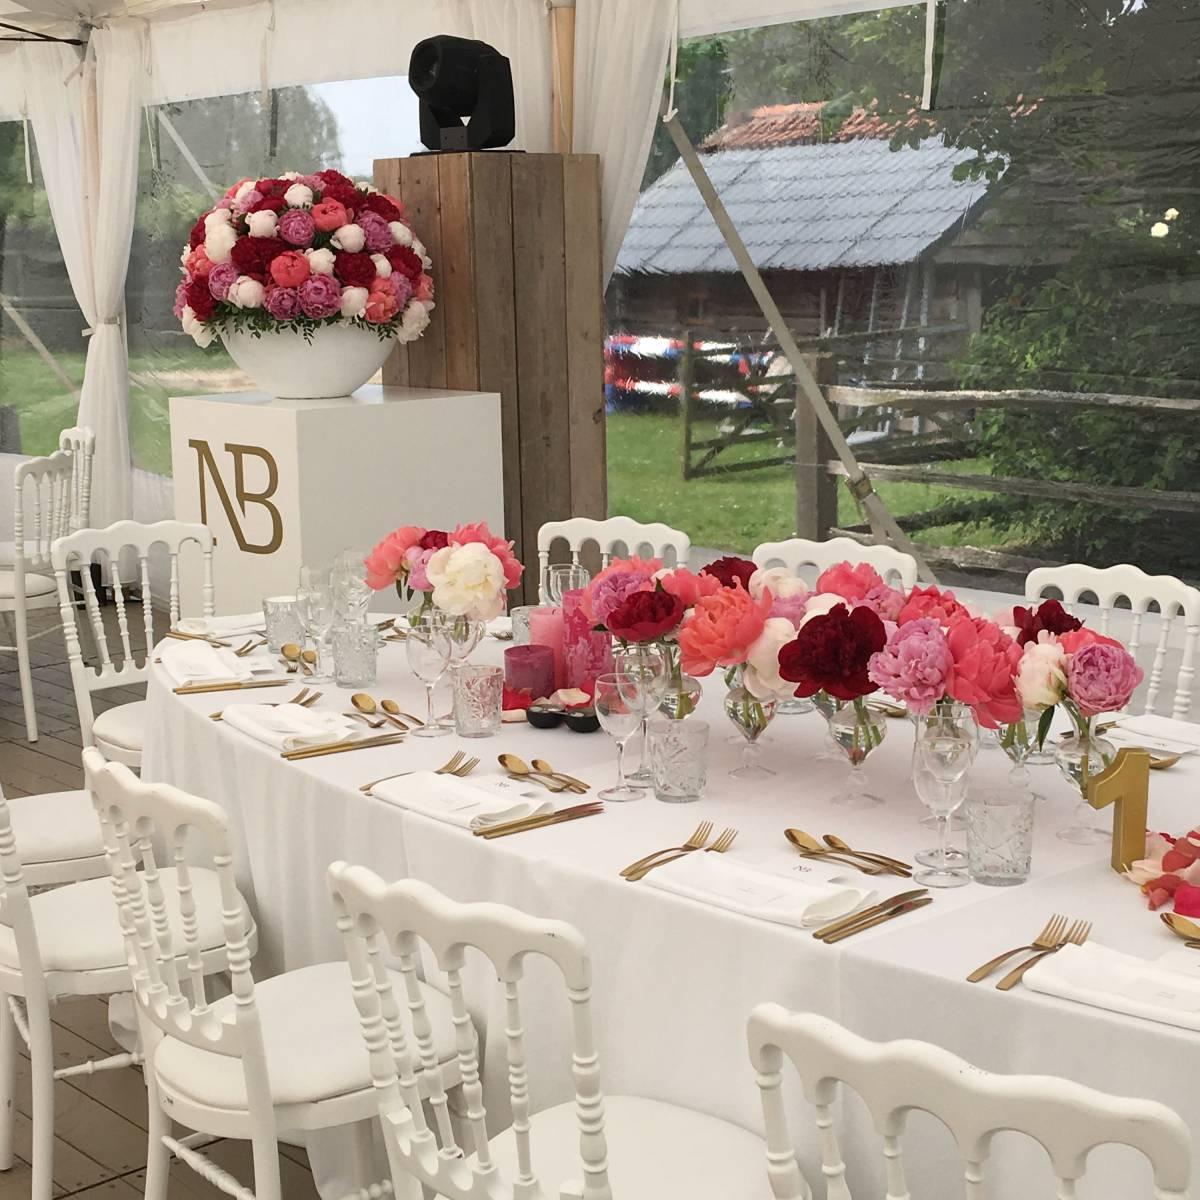 Maison Fleurie - Fotograaf zelfgetrokken - House of Weddings - 1